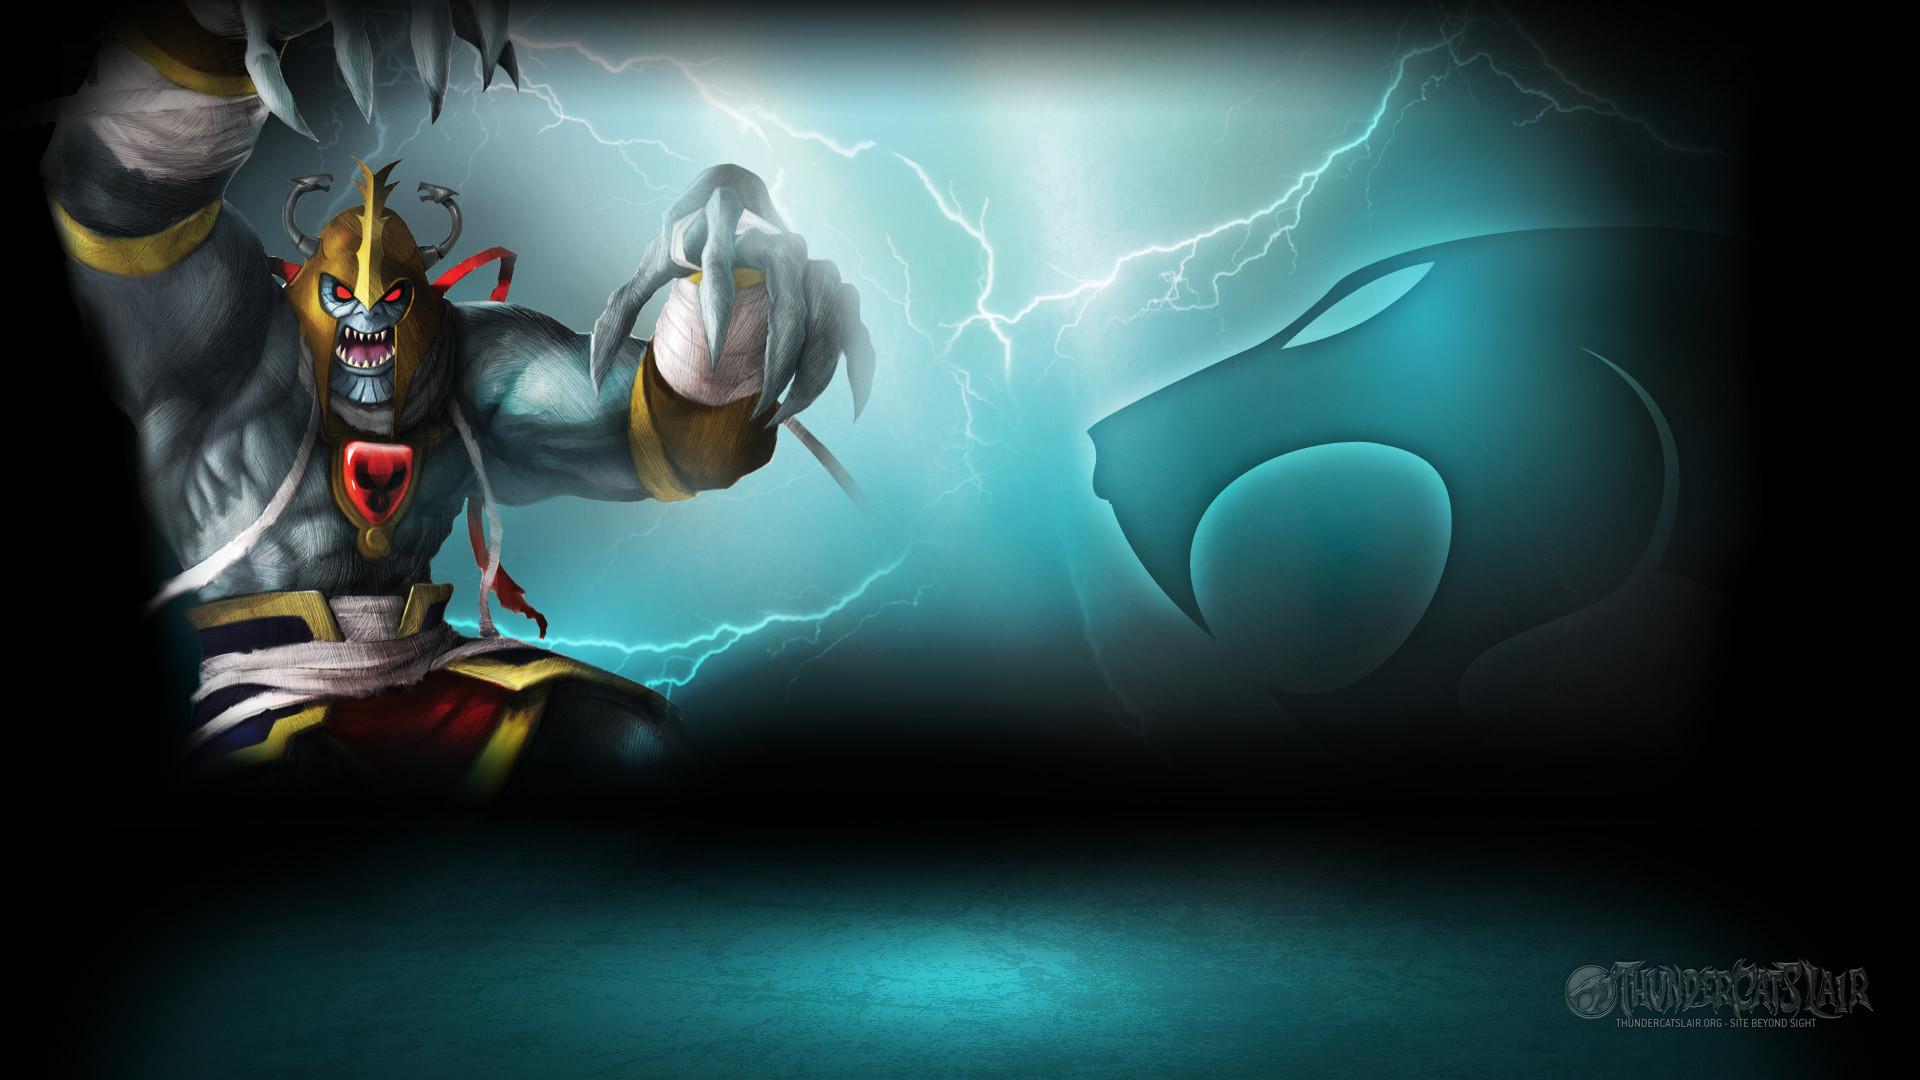 Thundercats Logo Wallpaper (61+ Images